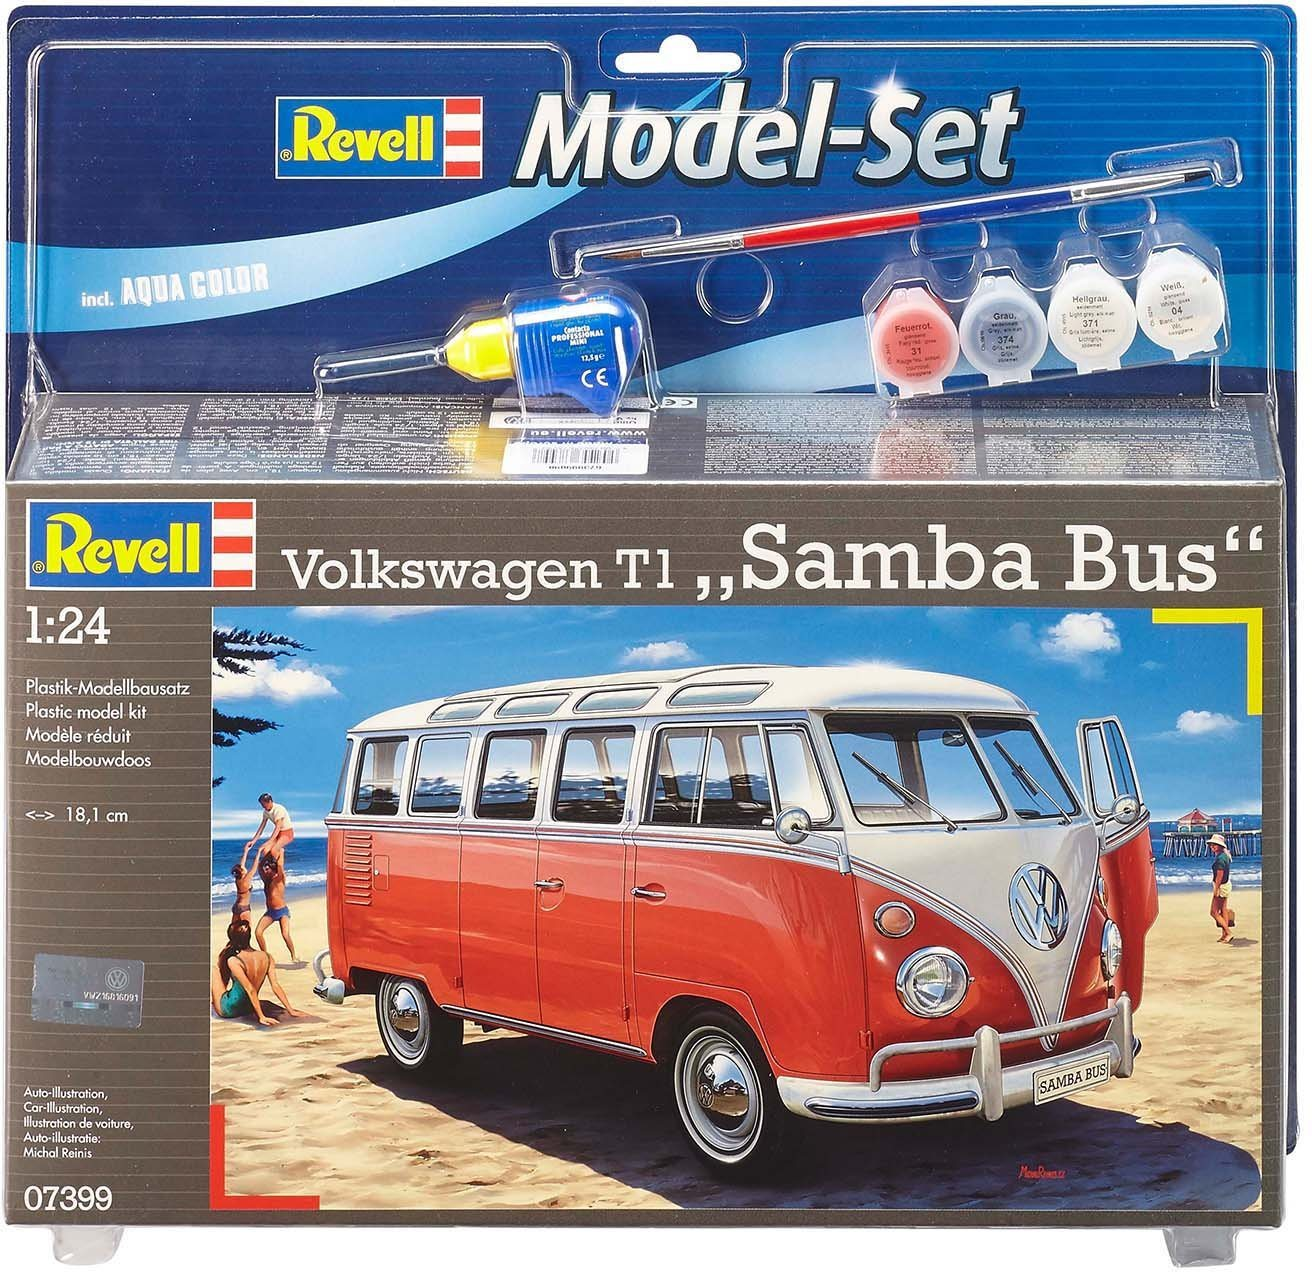 Revell® Modellbausatz Bus, Maßstab 1:24, »Model Set VW T1 Samba Bus«